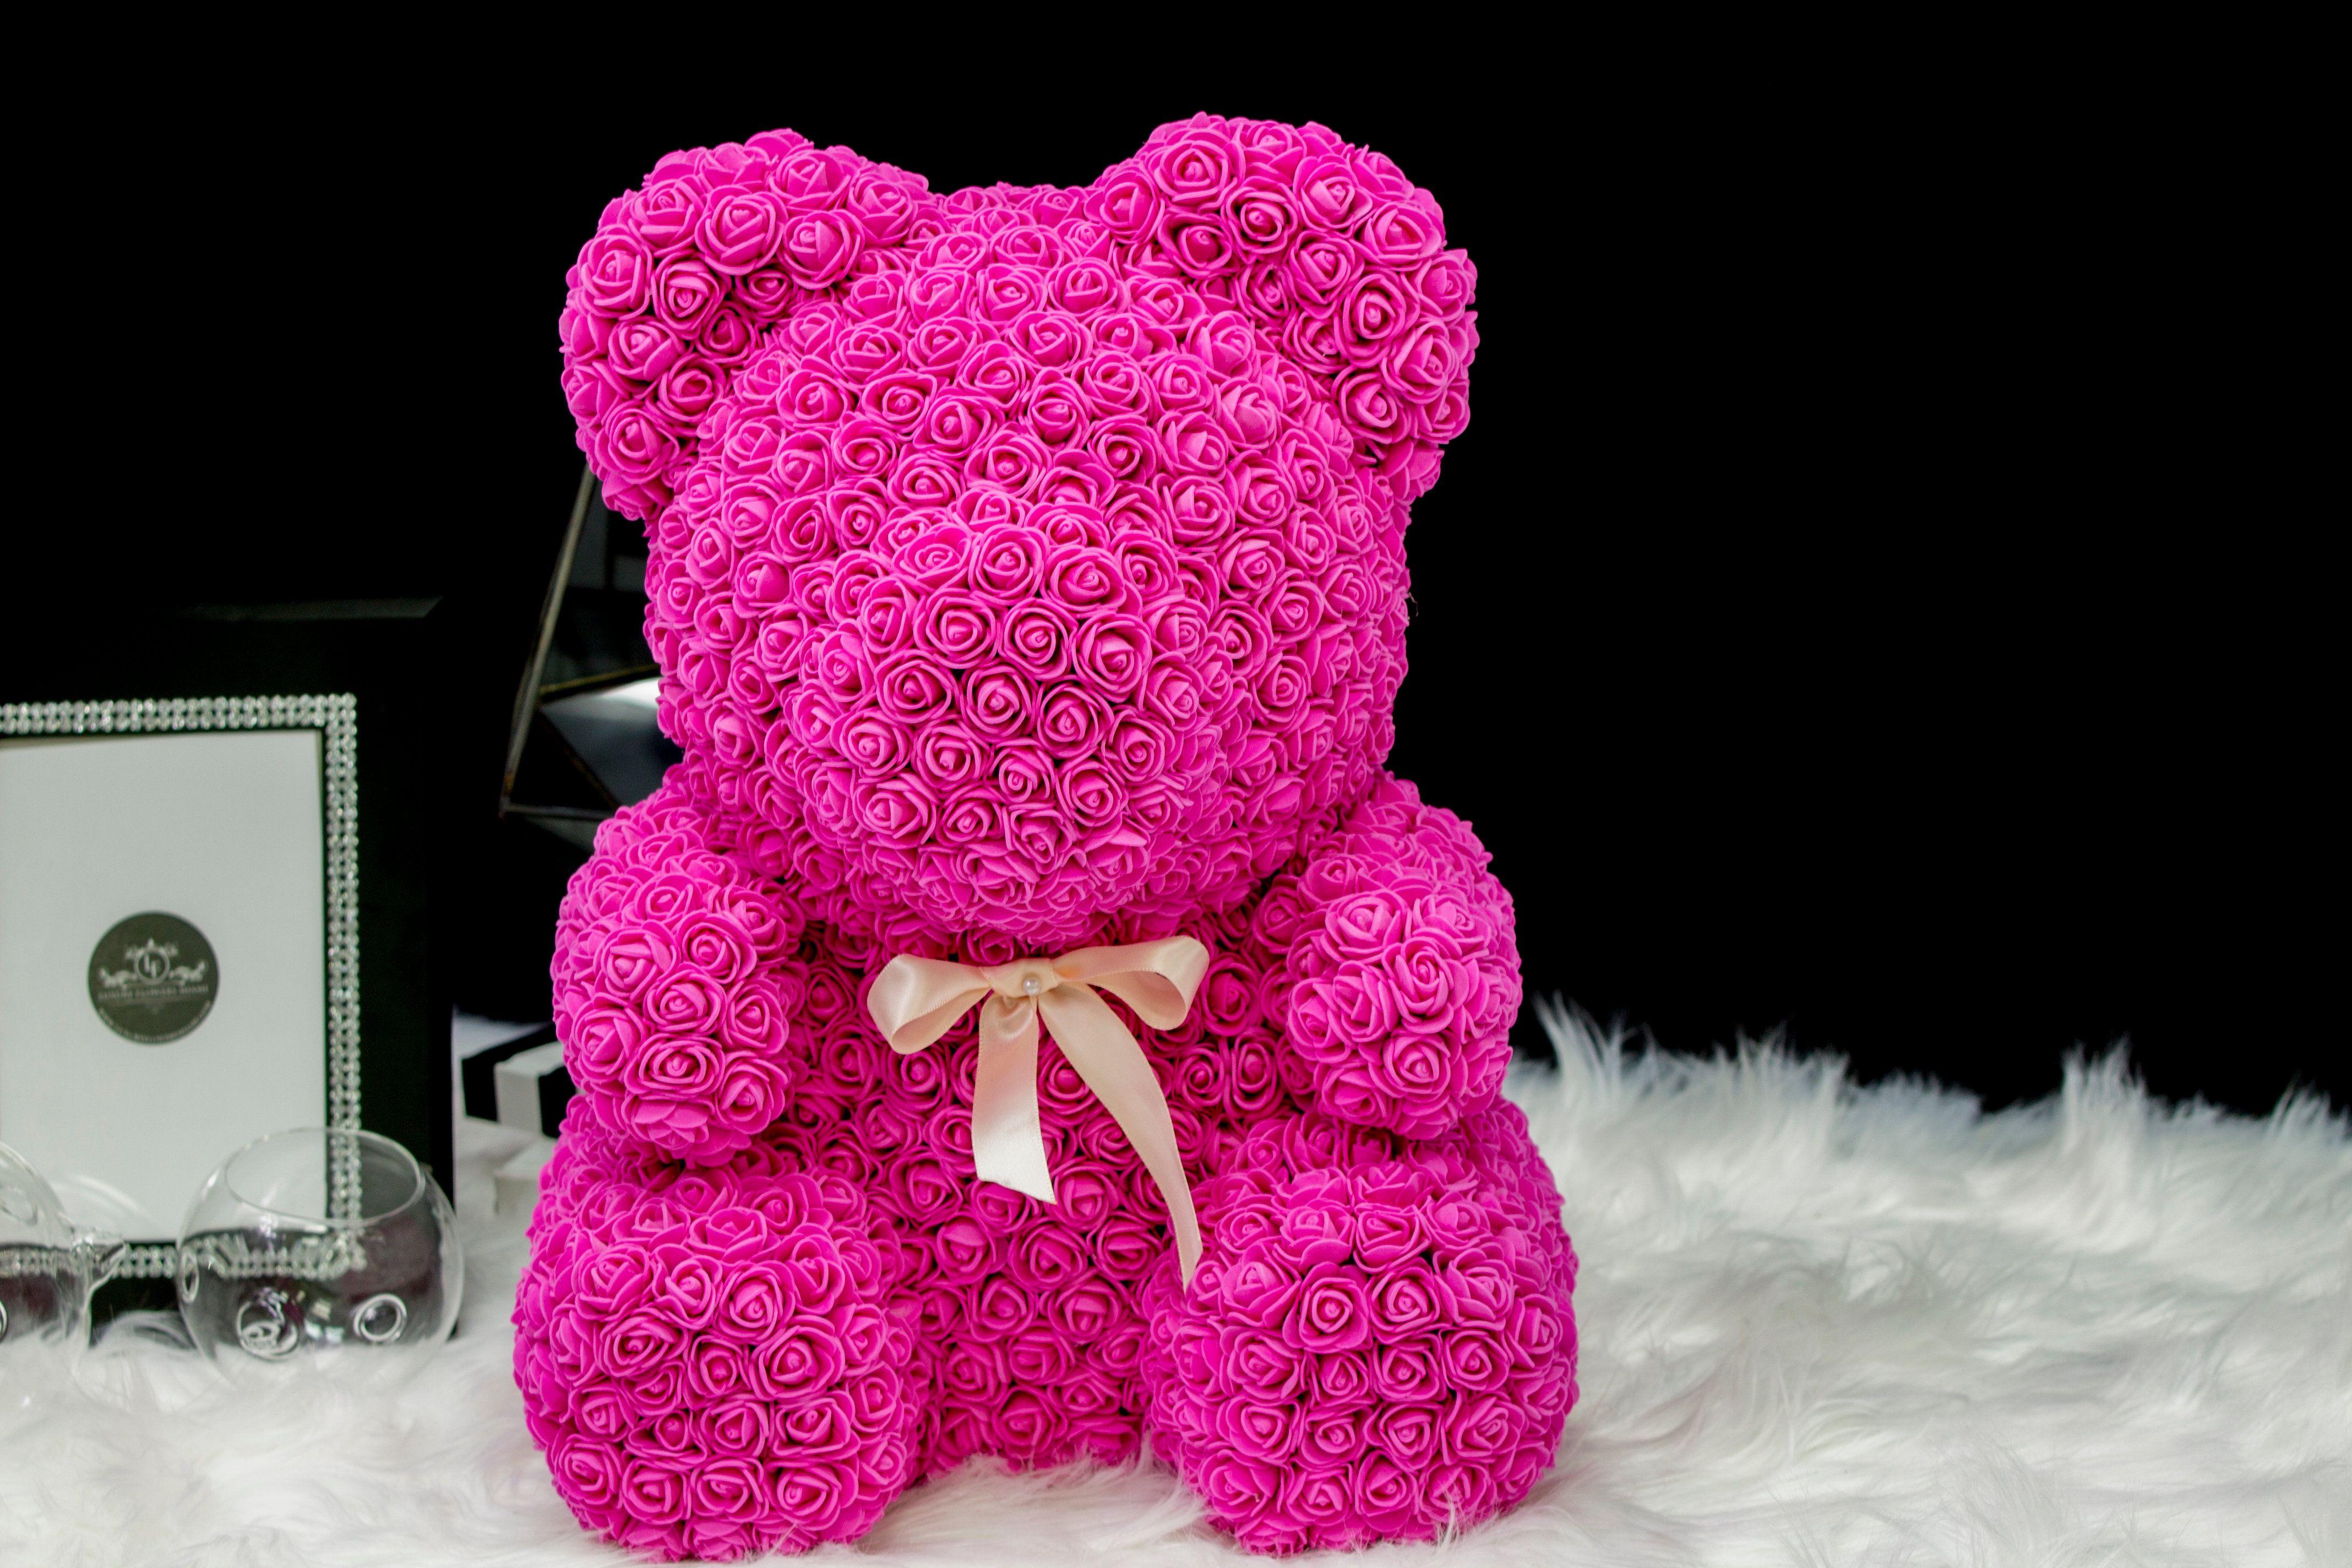 Rose Teddy Bear Luxury flowers, Lauderdale by the sea